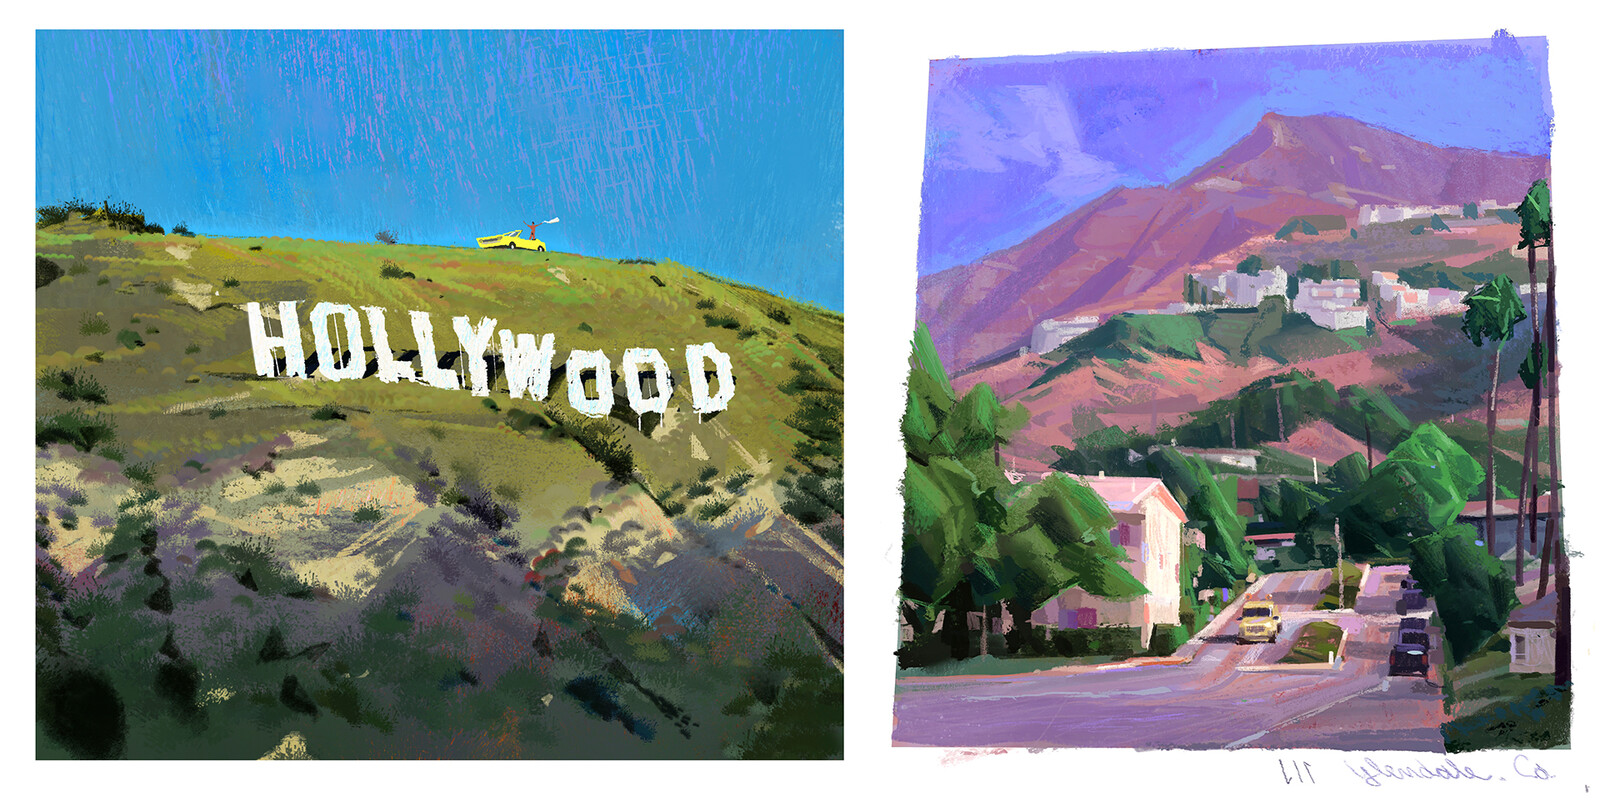 West Hollywood / Glendale CA